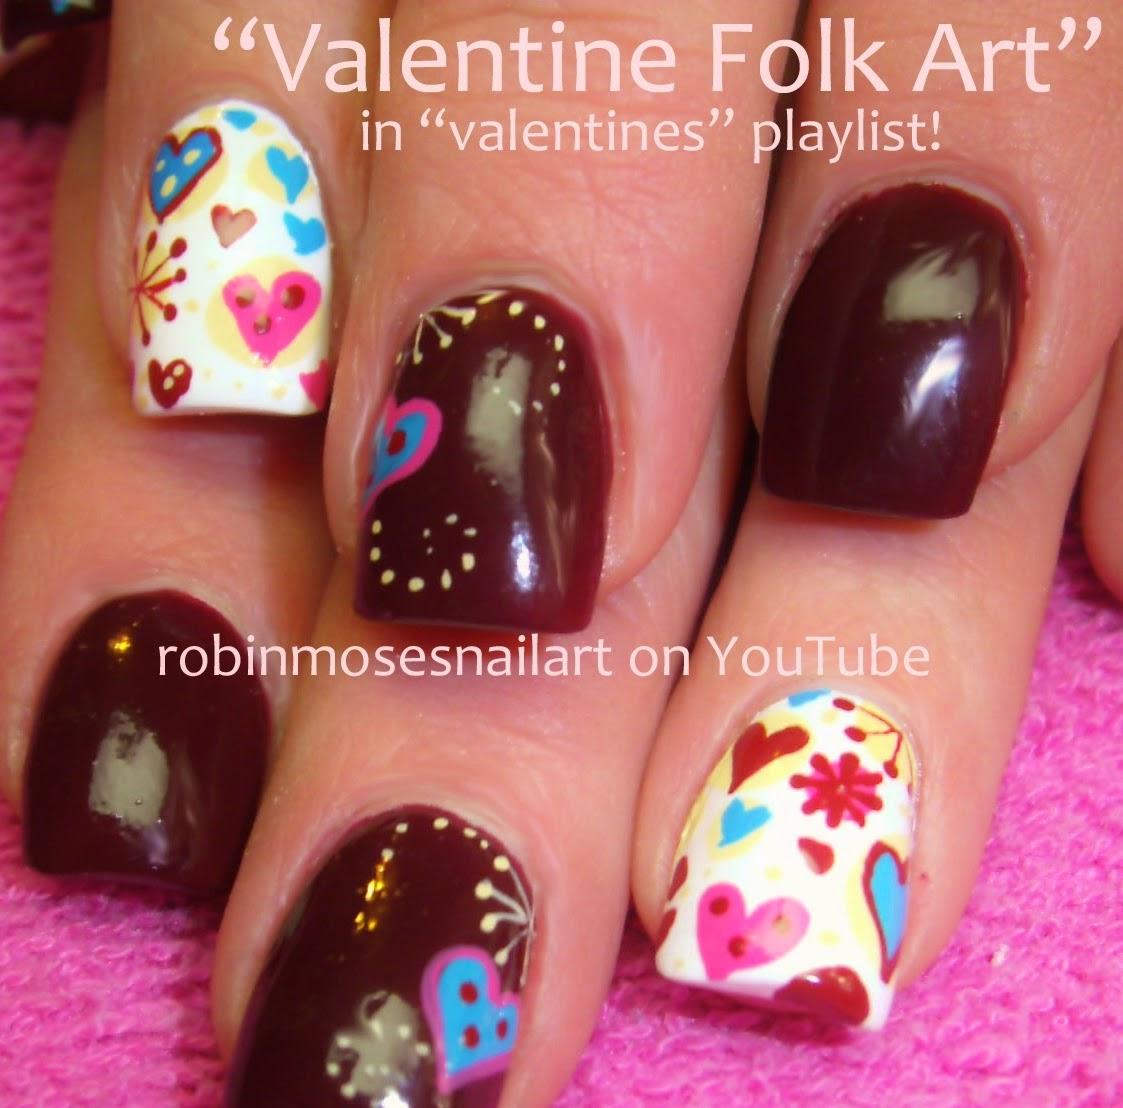 "Robin Moses Nail Art February 2015: Robin Moses Nail Art: ""Valentine's Day Nail Art"" A GALLERY"